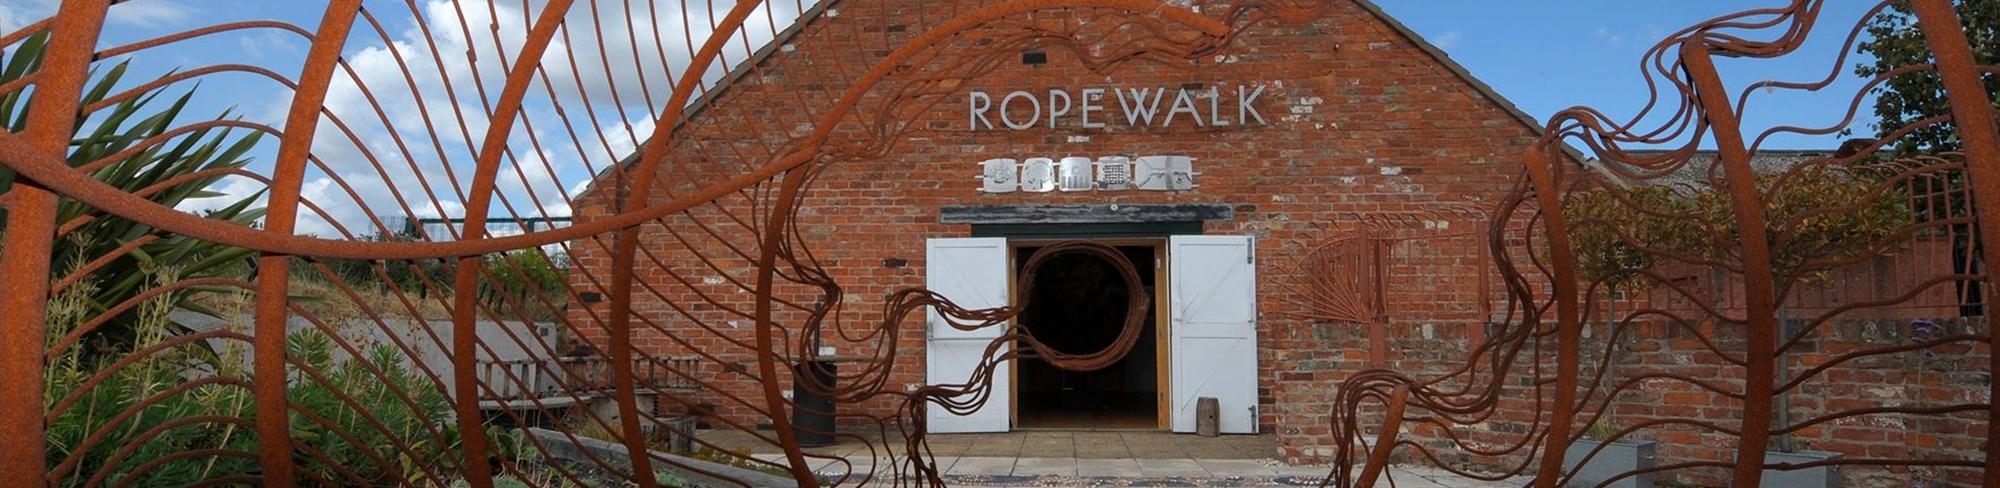 Ropewalk banner